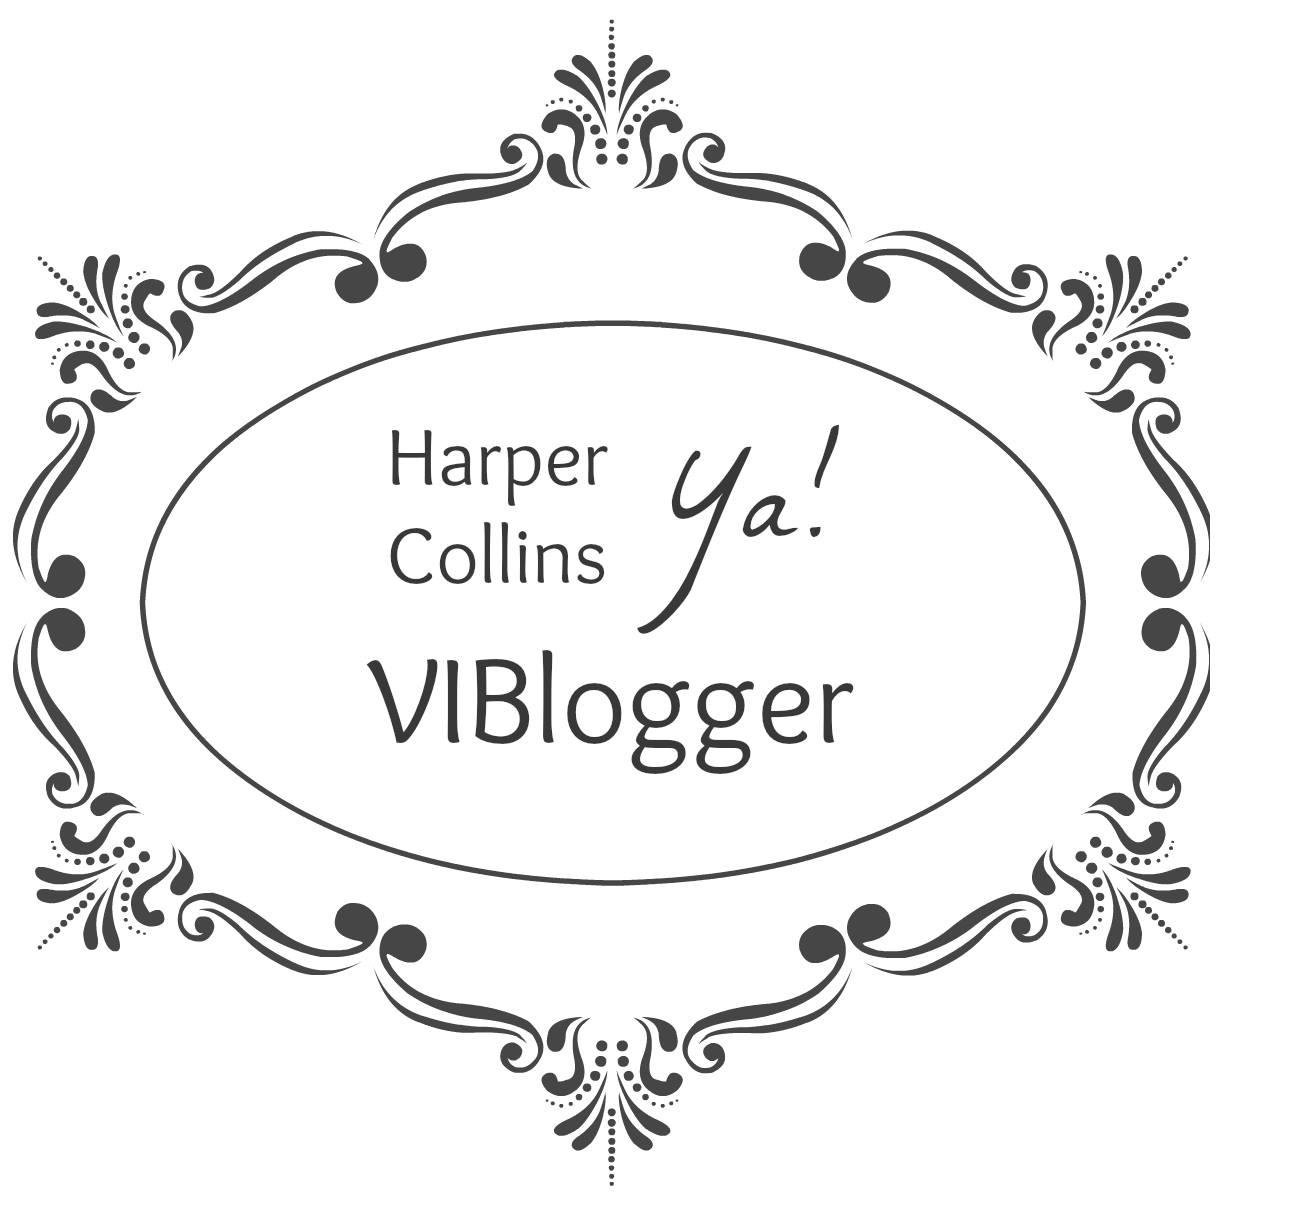 HarperCollins ya!  VIBlogger